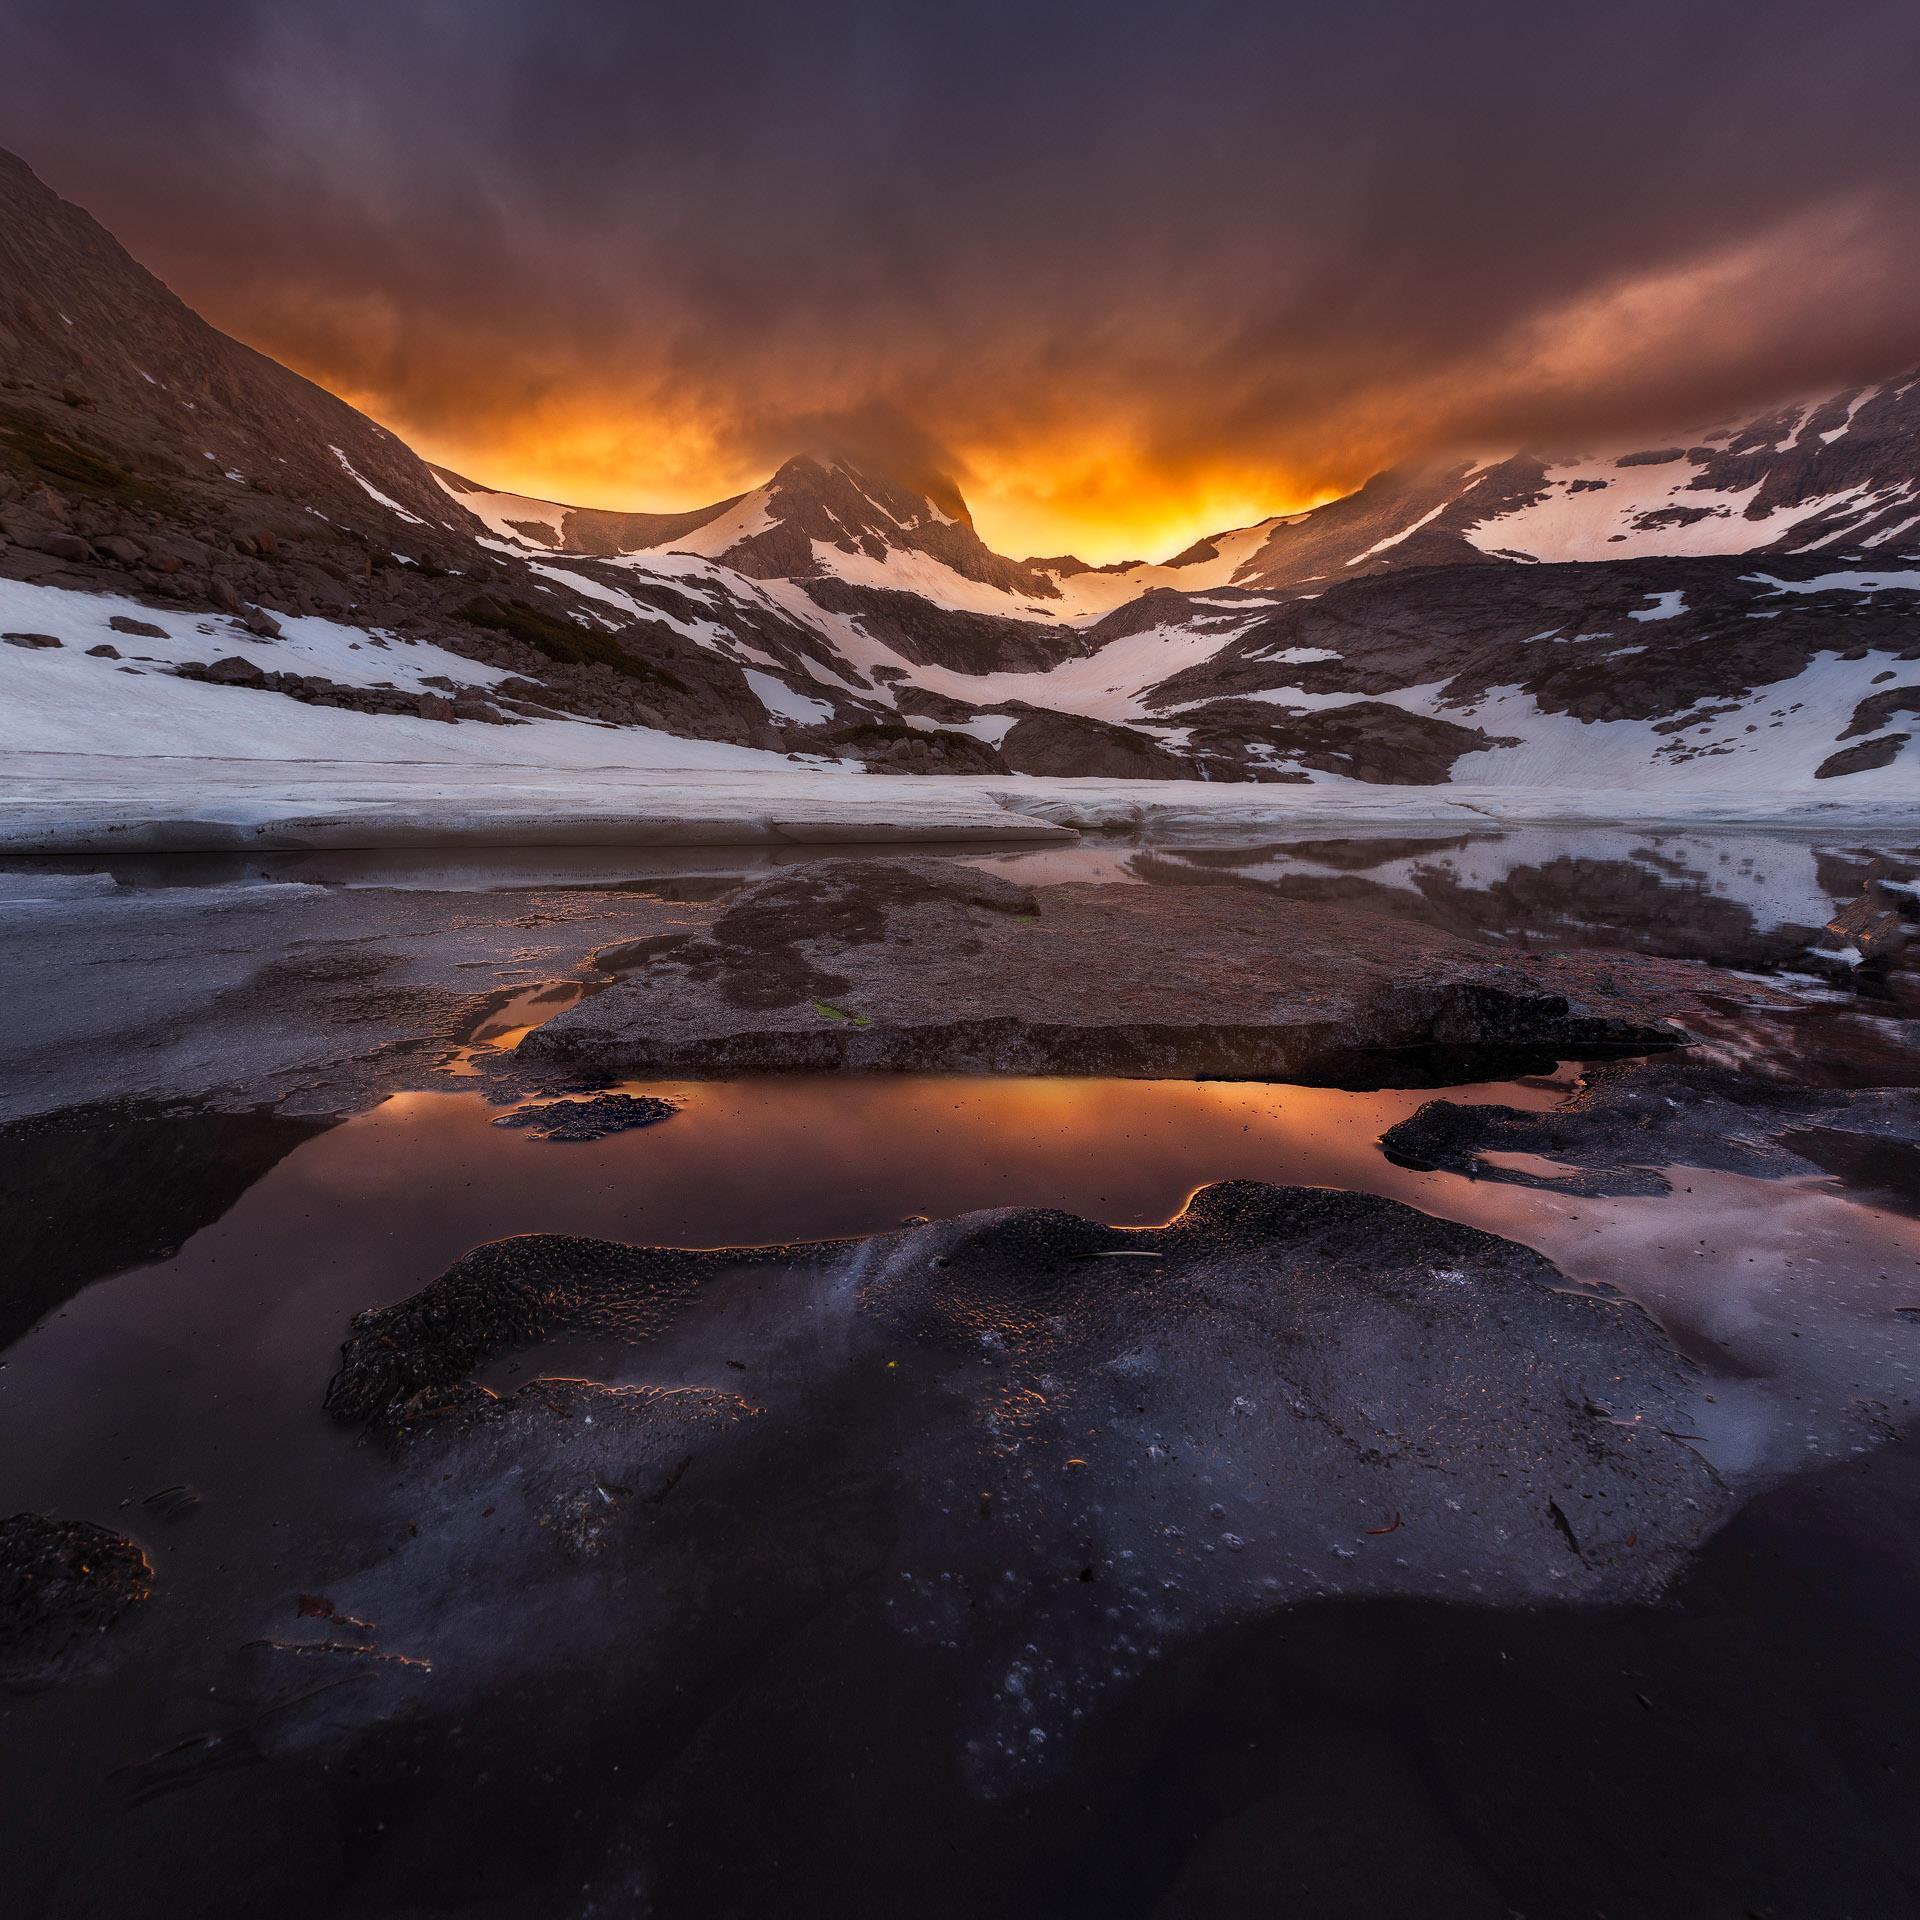 Sunset at Blue Lake | David Kingham Photography